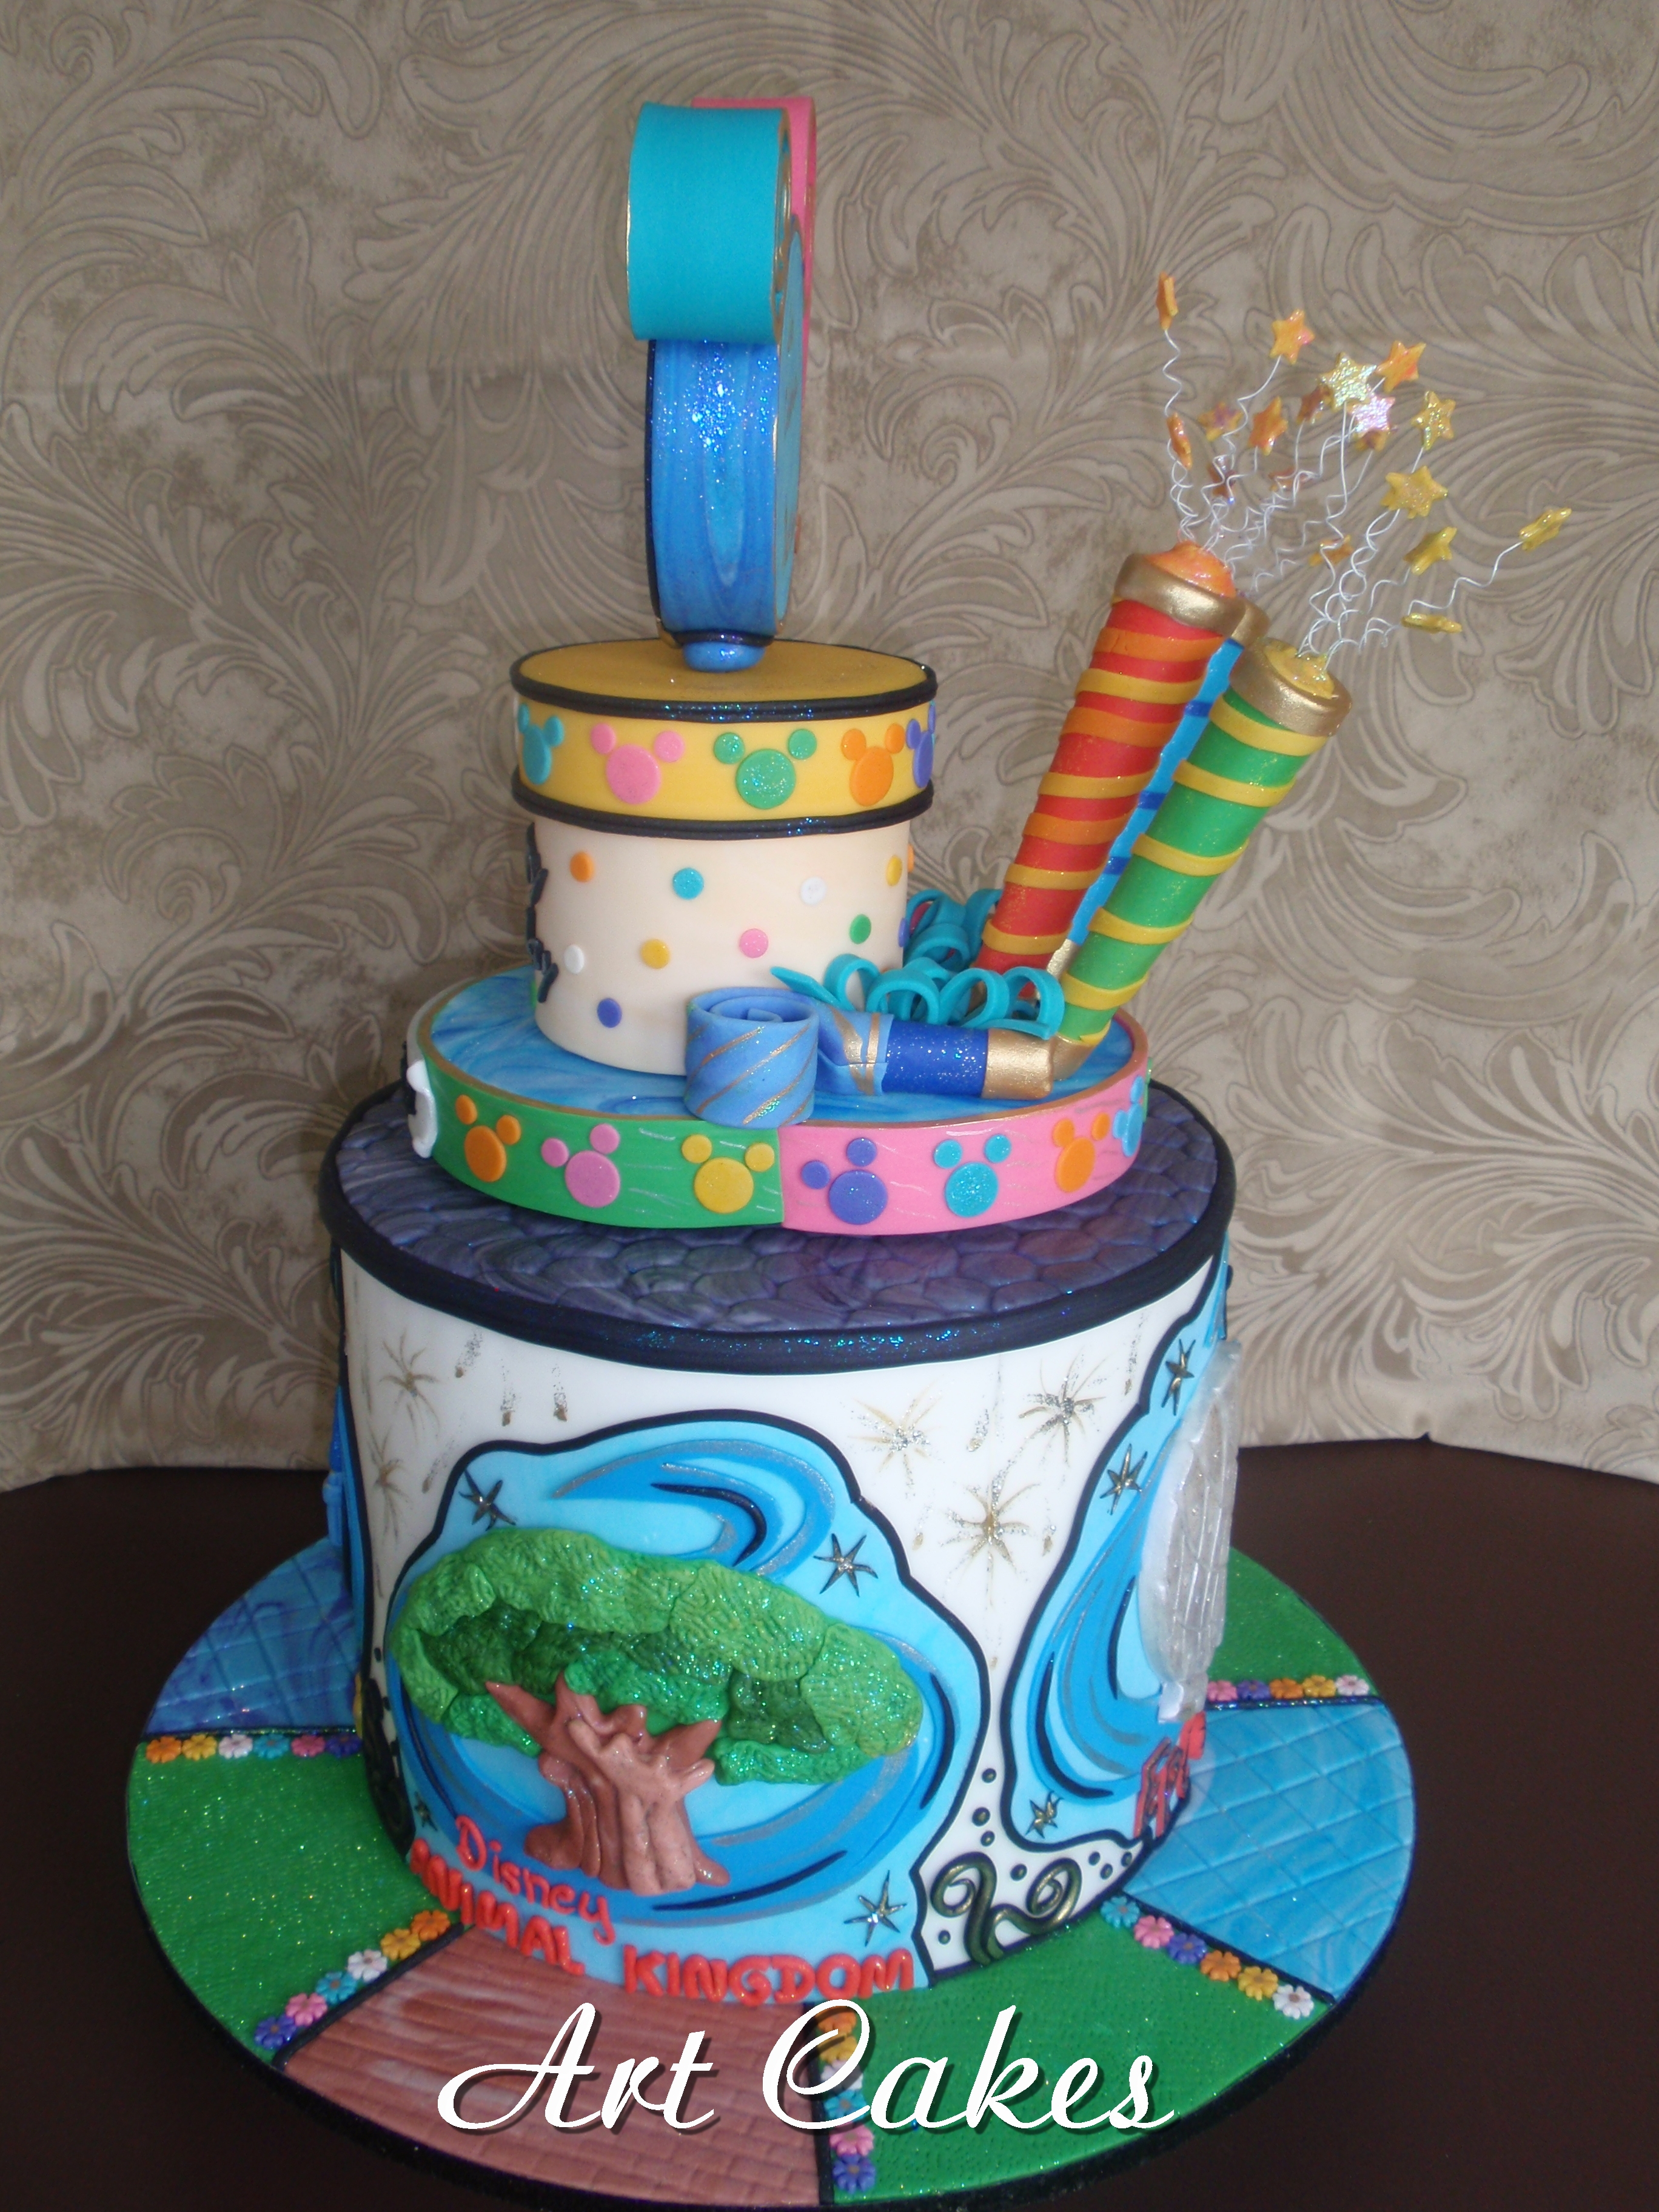 Astounding Disneyworld Birthday Cake Cakecentral Com Funny Birthday Cards Online Inifofree Goldxyz